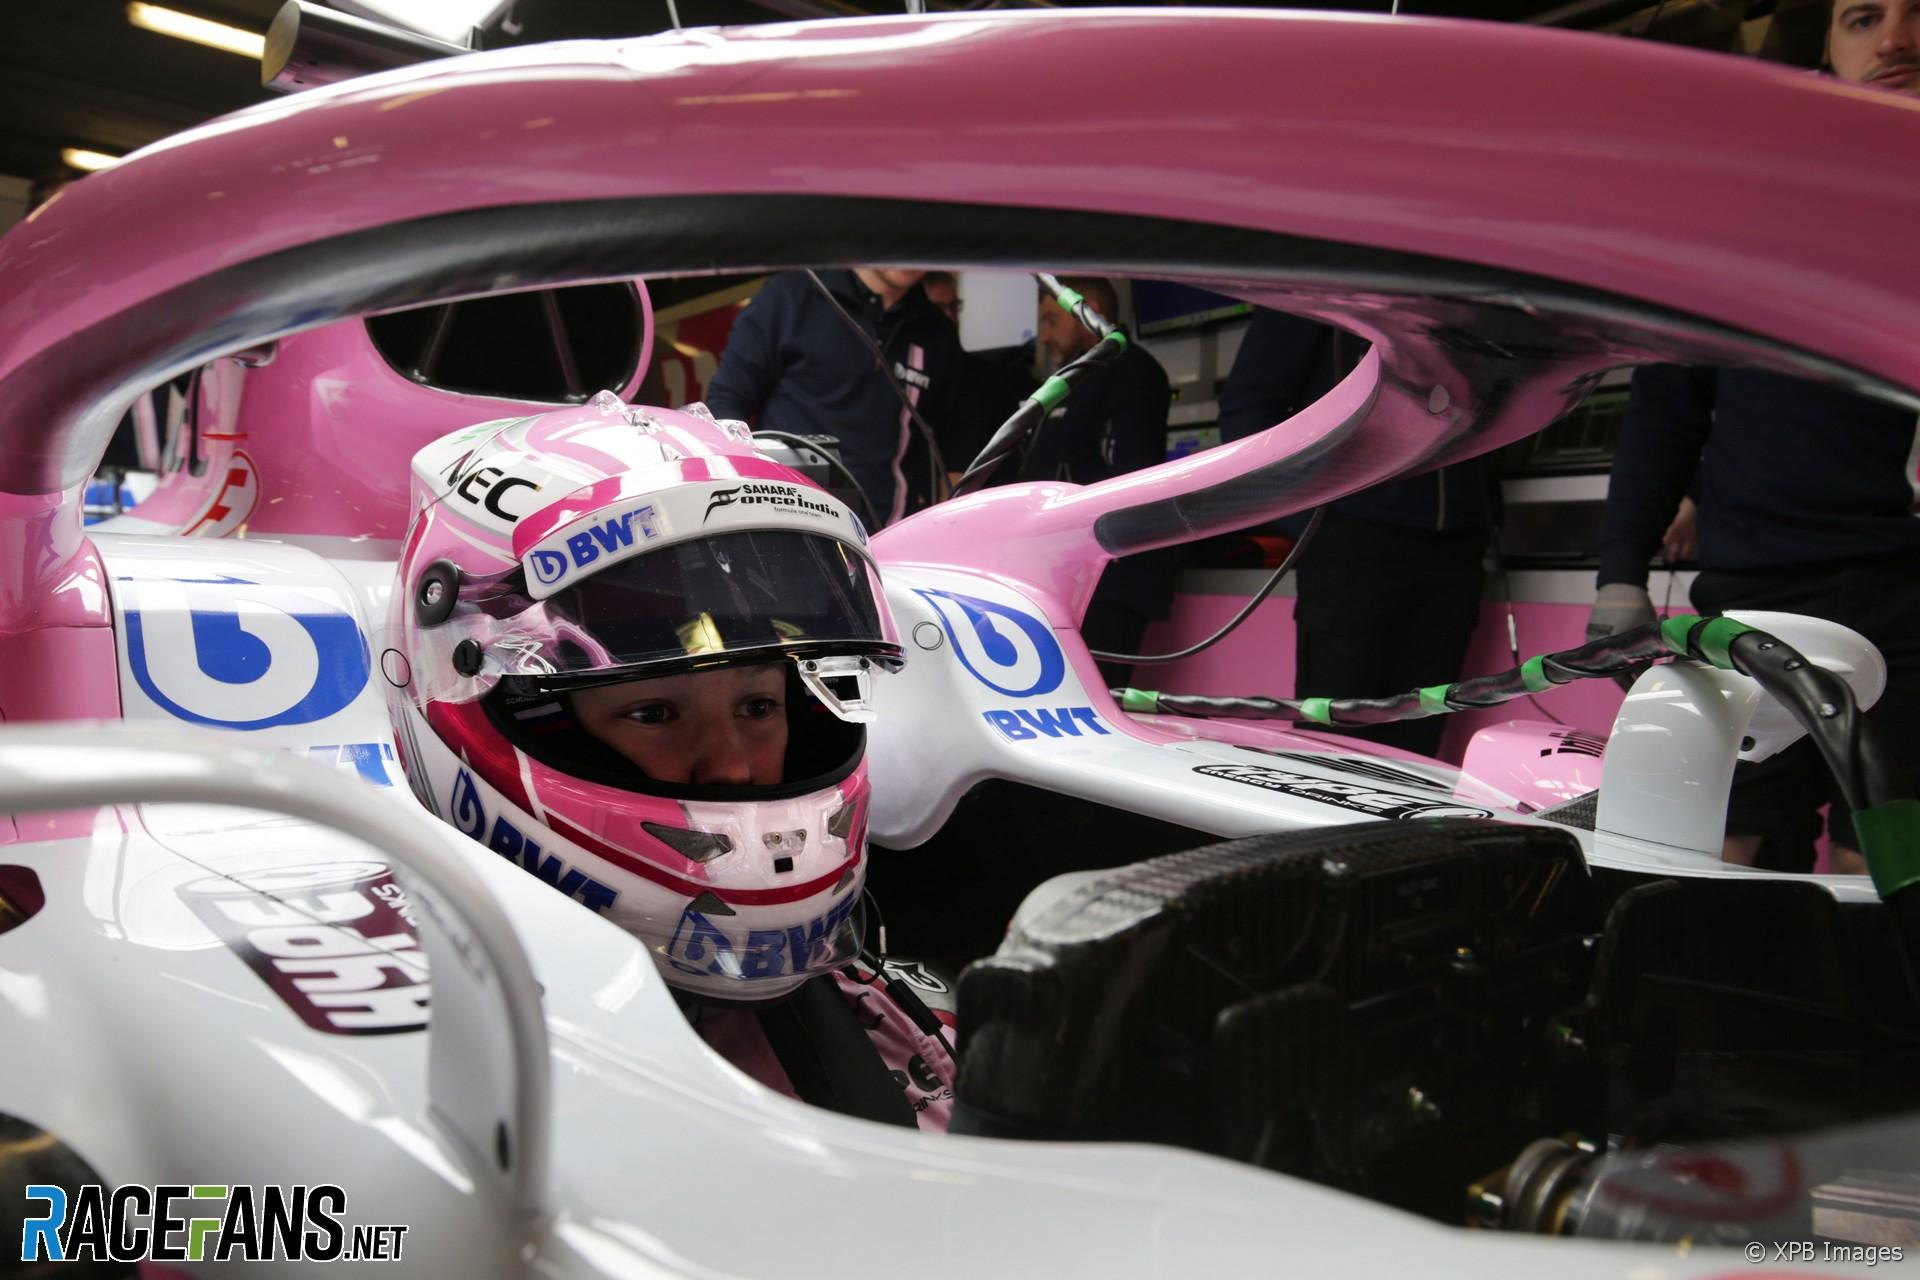 Nikita Mazepin, Force India, Circuit de Catalunya, 2018